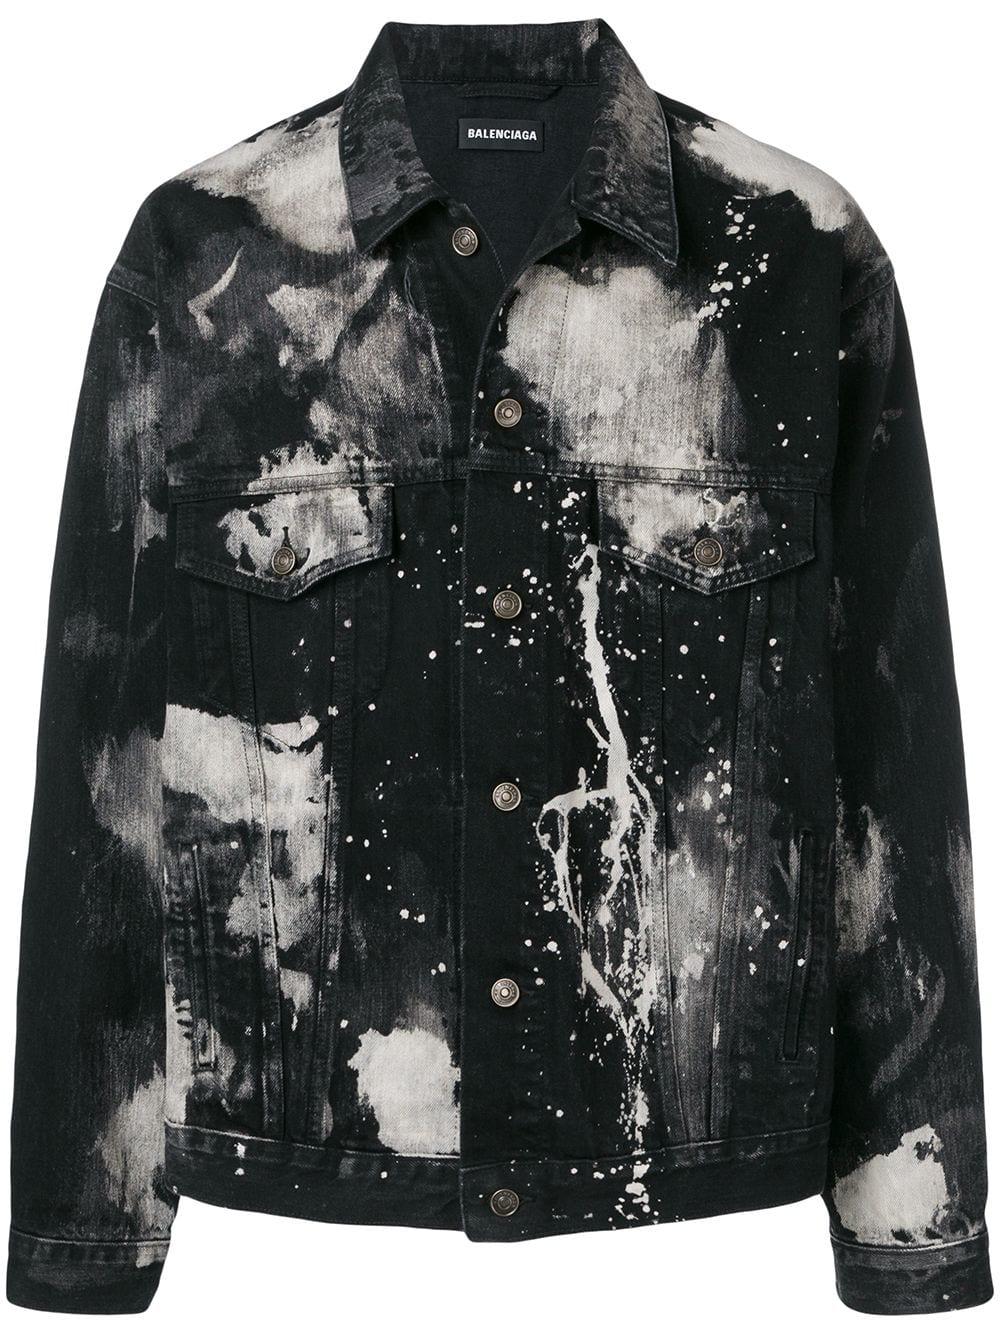 Balenciaga Paint Stain Denim Jacket Farfetch Bleached Denim Jacket Denim Jacket Men Denim Jacket Men Style [ 1334 x 1000 Pixel ]